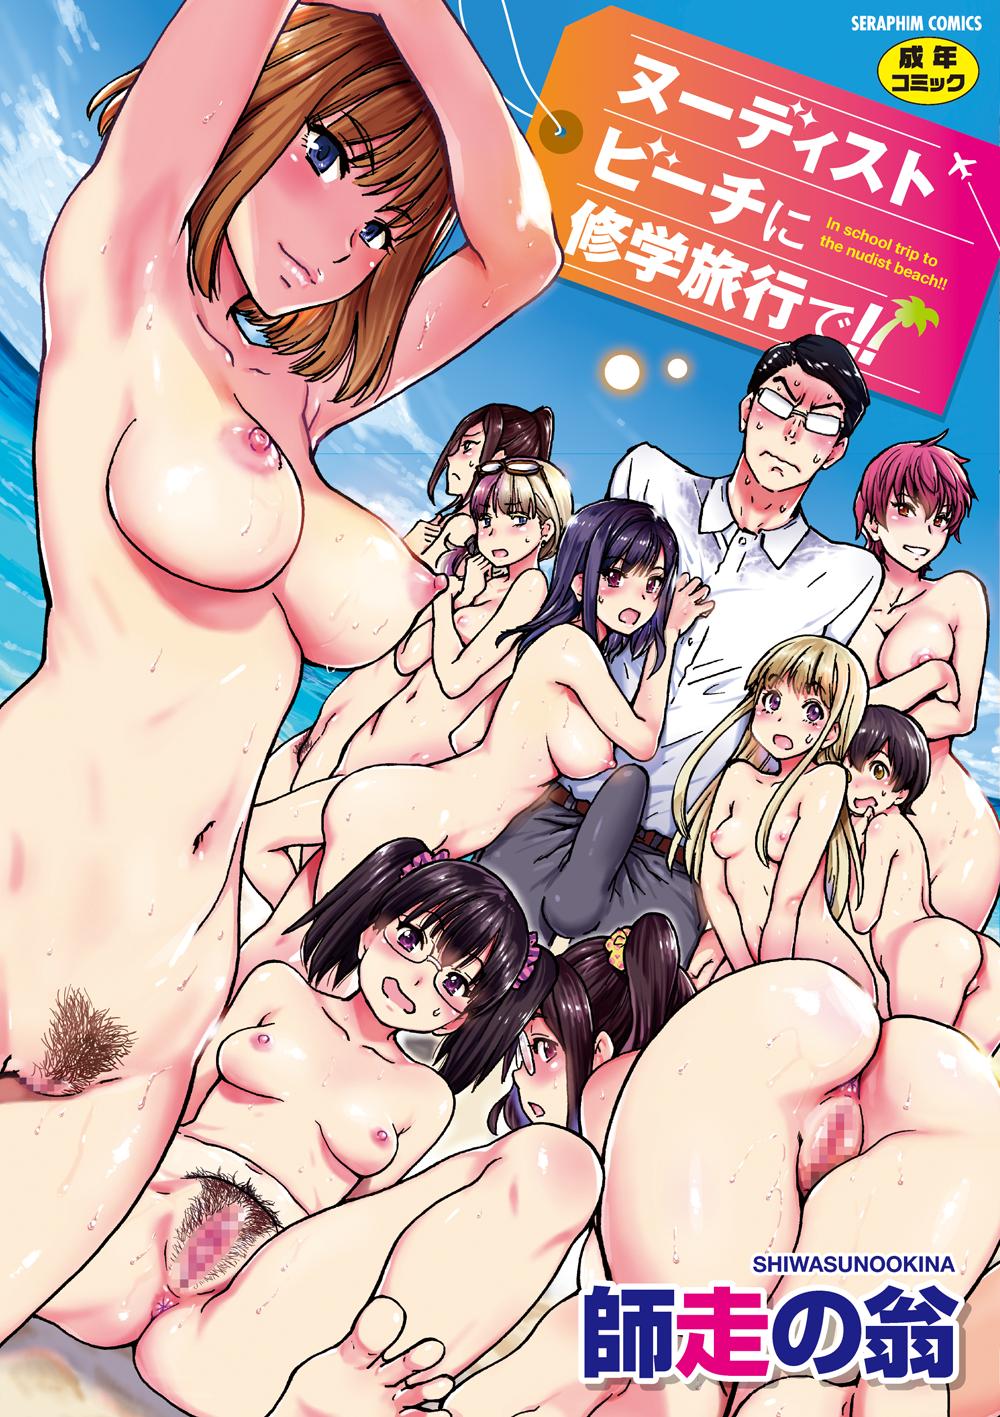 Hentai nudity hairy gallery nudes sexgirls